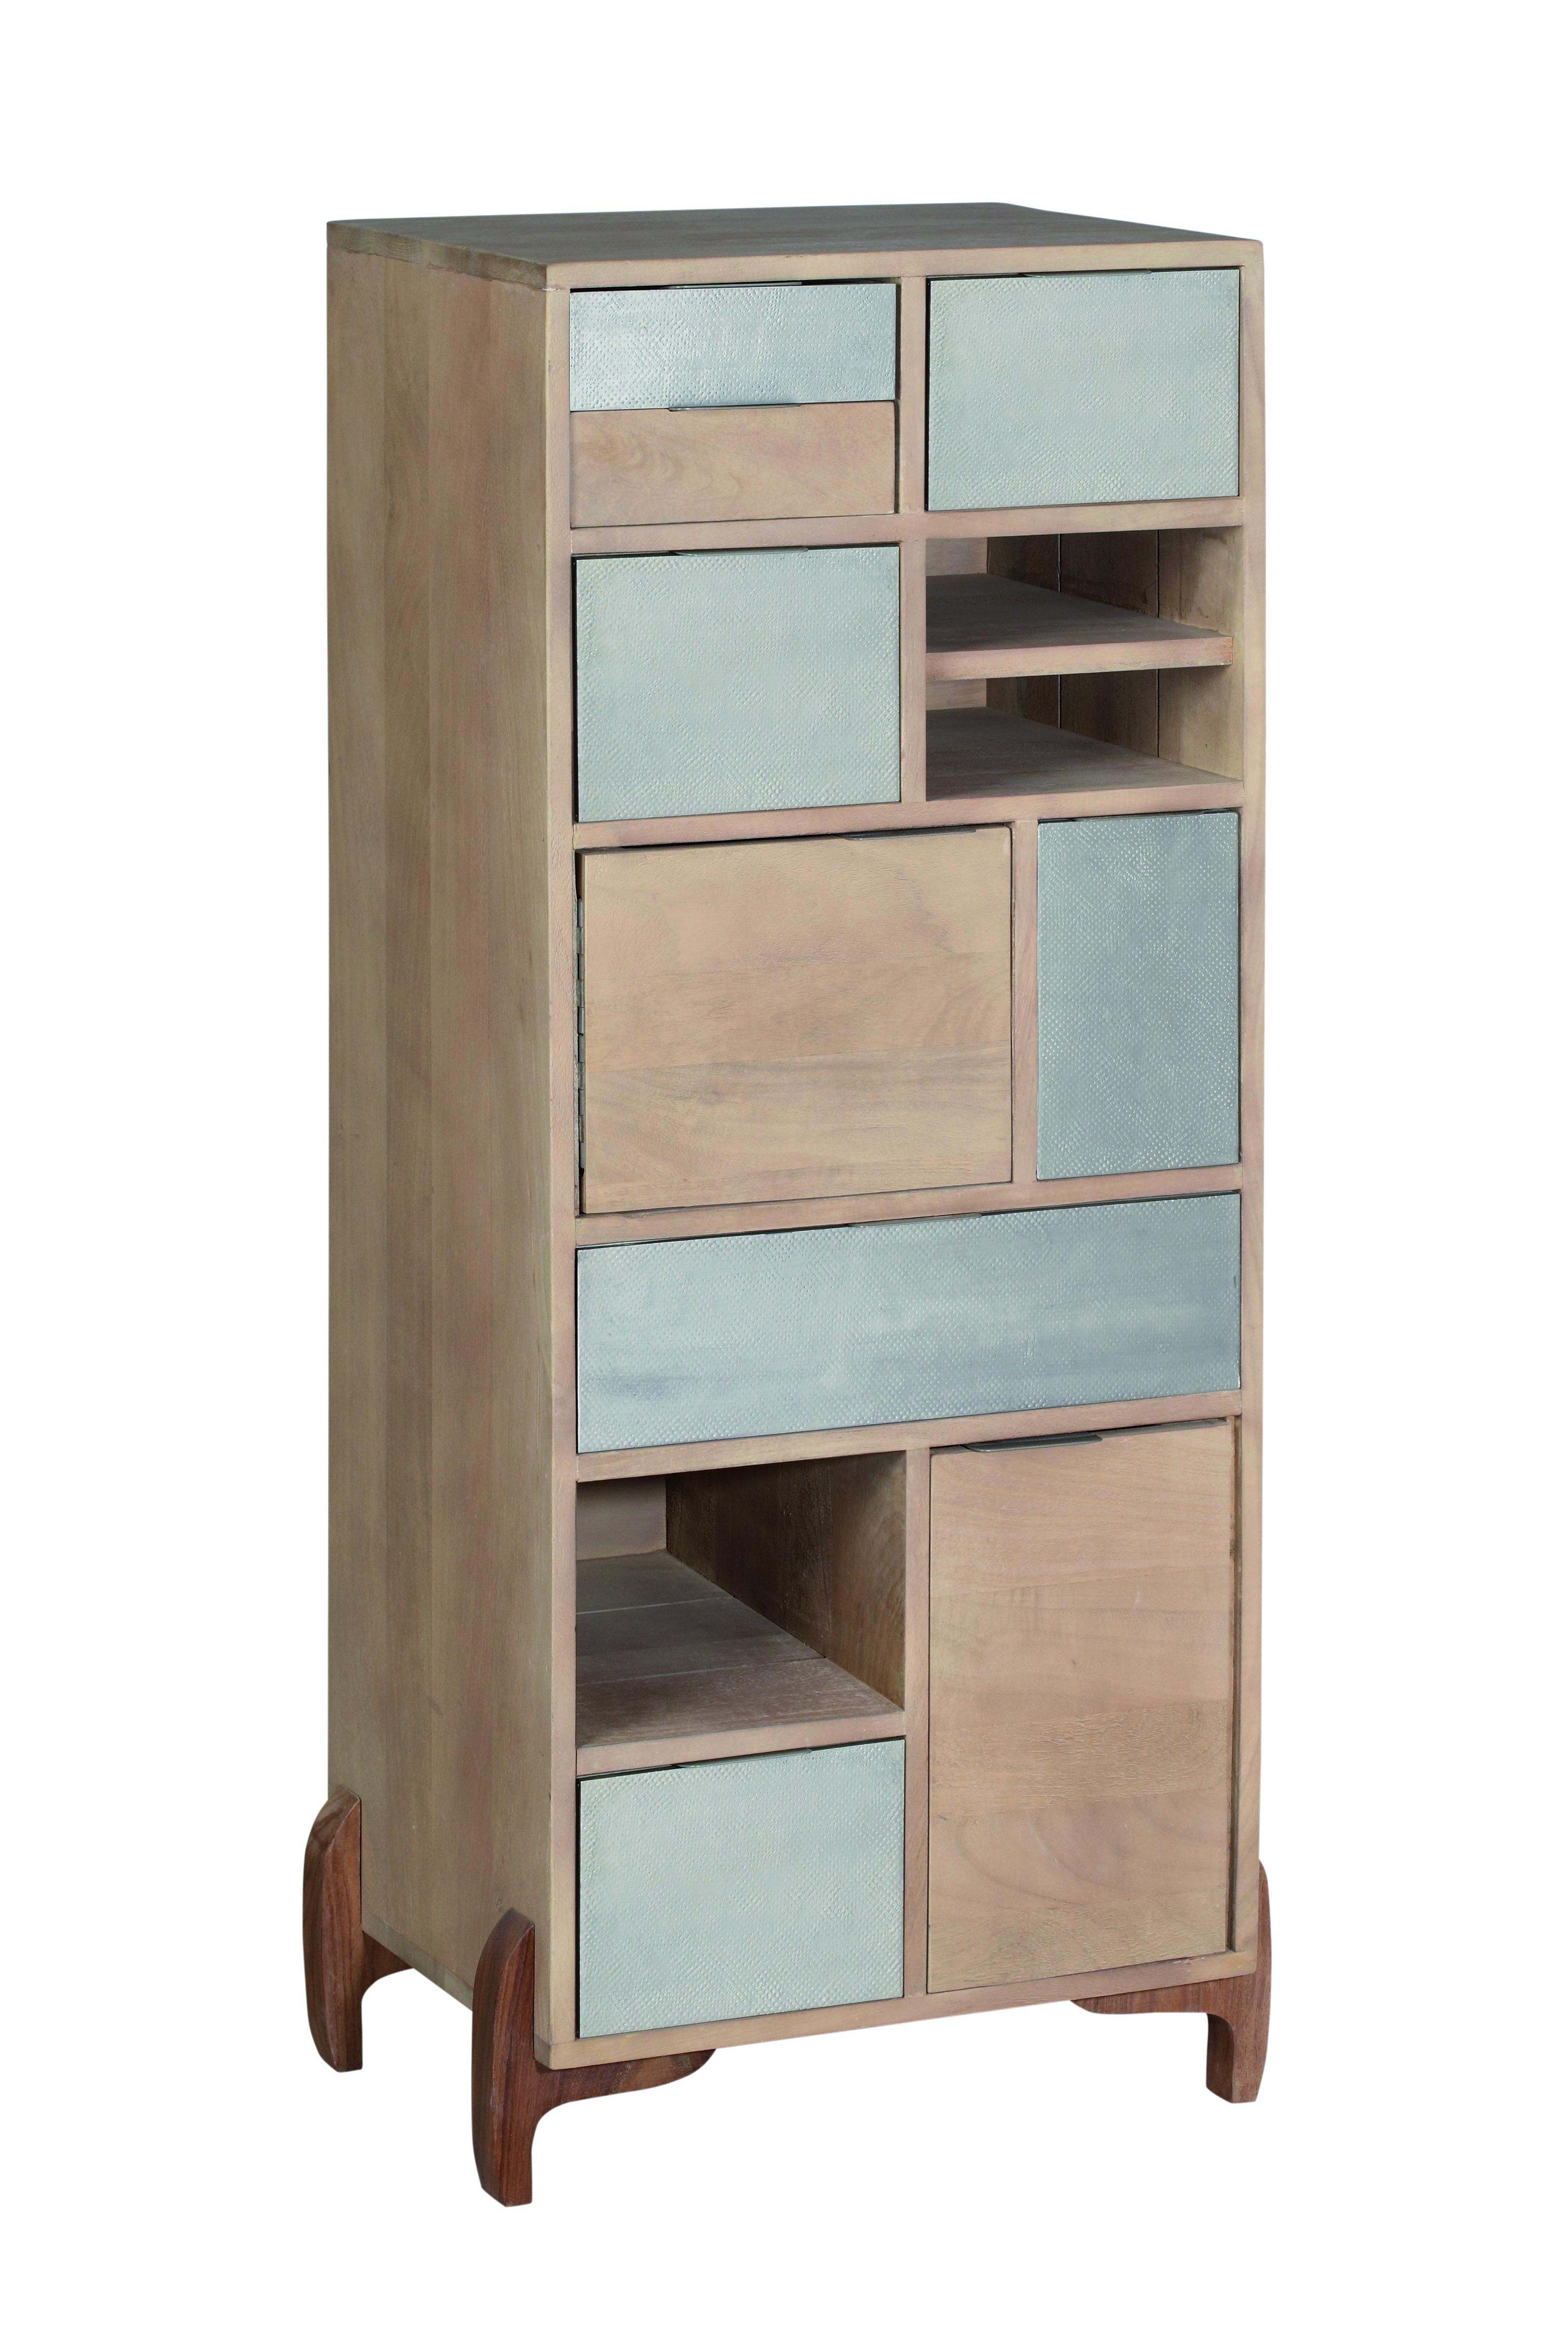 Cabinet din lemn cu 6 sertare si 3 usi Pasadena Natural l49xA35xH111 cm